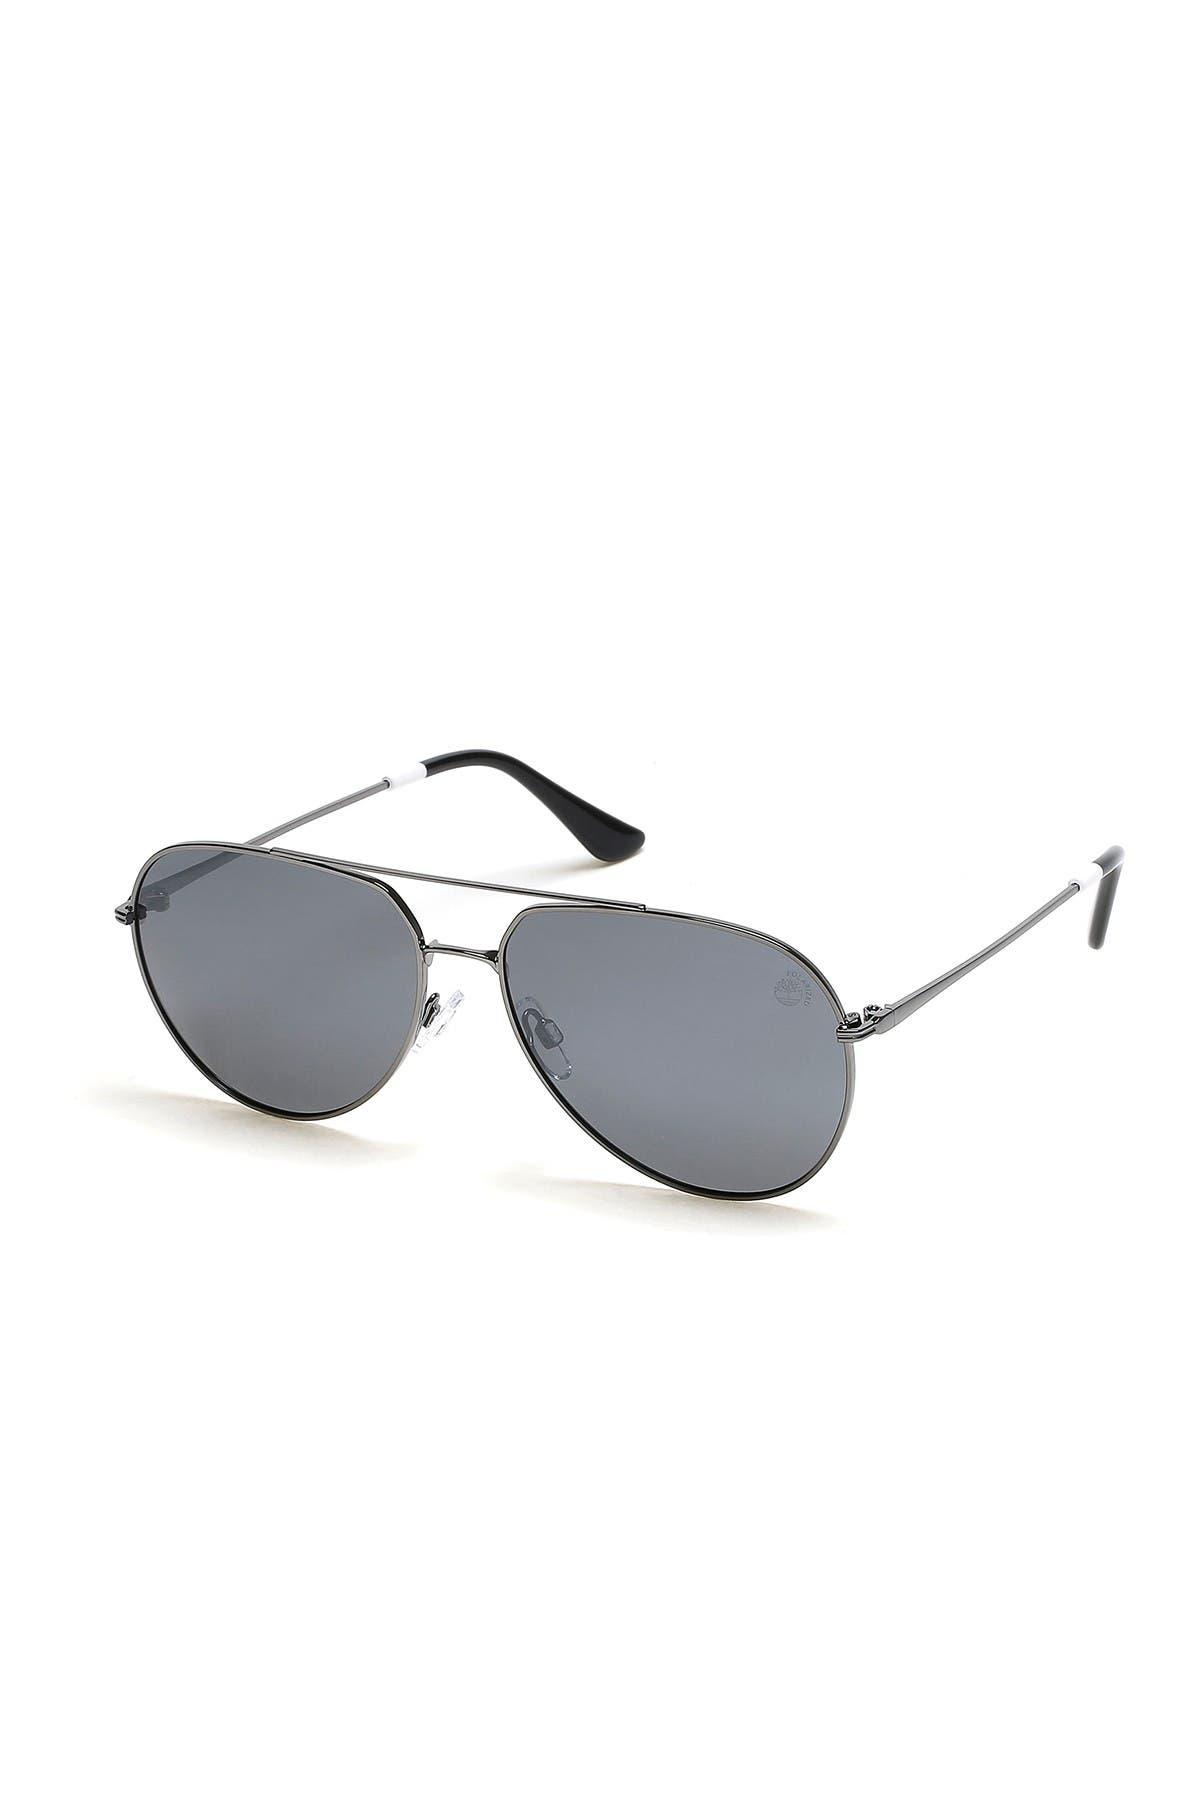 Image of Timberland 60mm Aviator Sunglasses